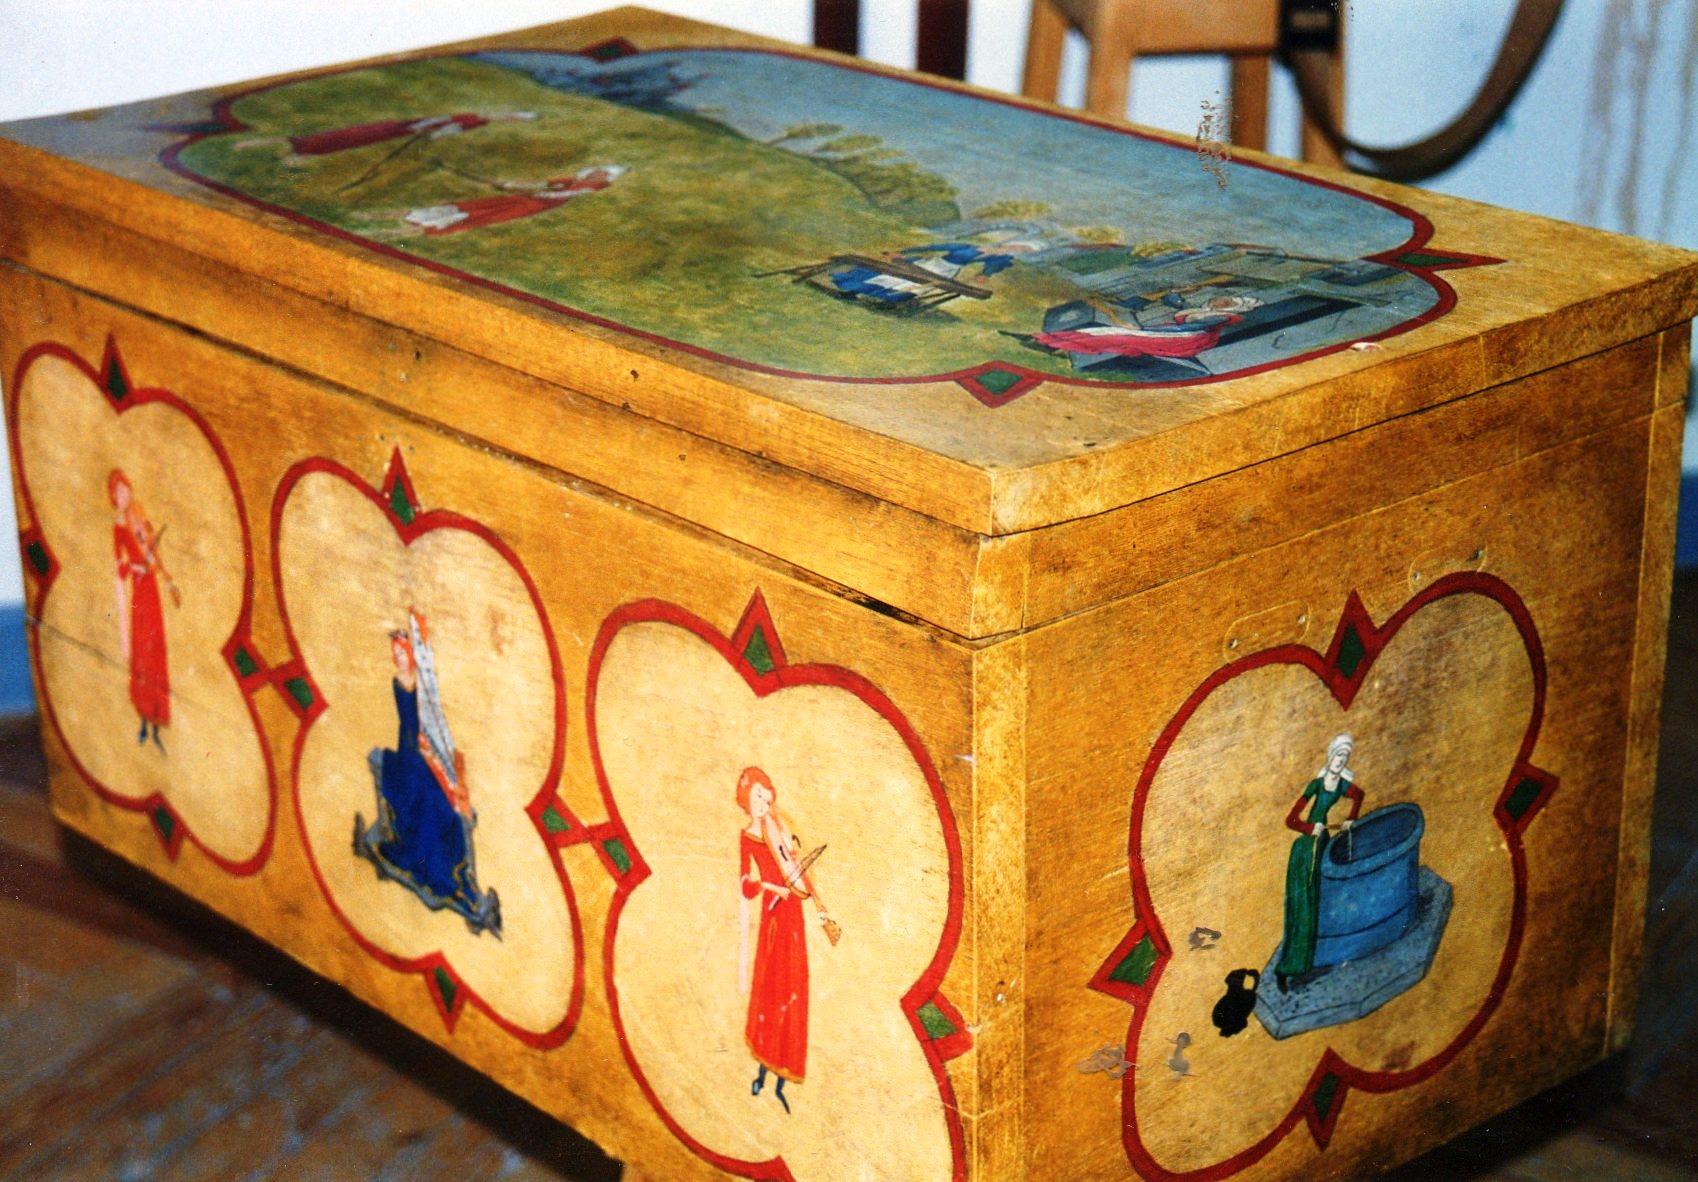 Muebles pintados ram n cano pic - Muebles de mimbre pintados ...